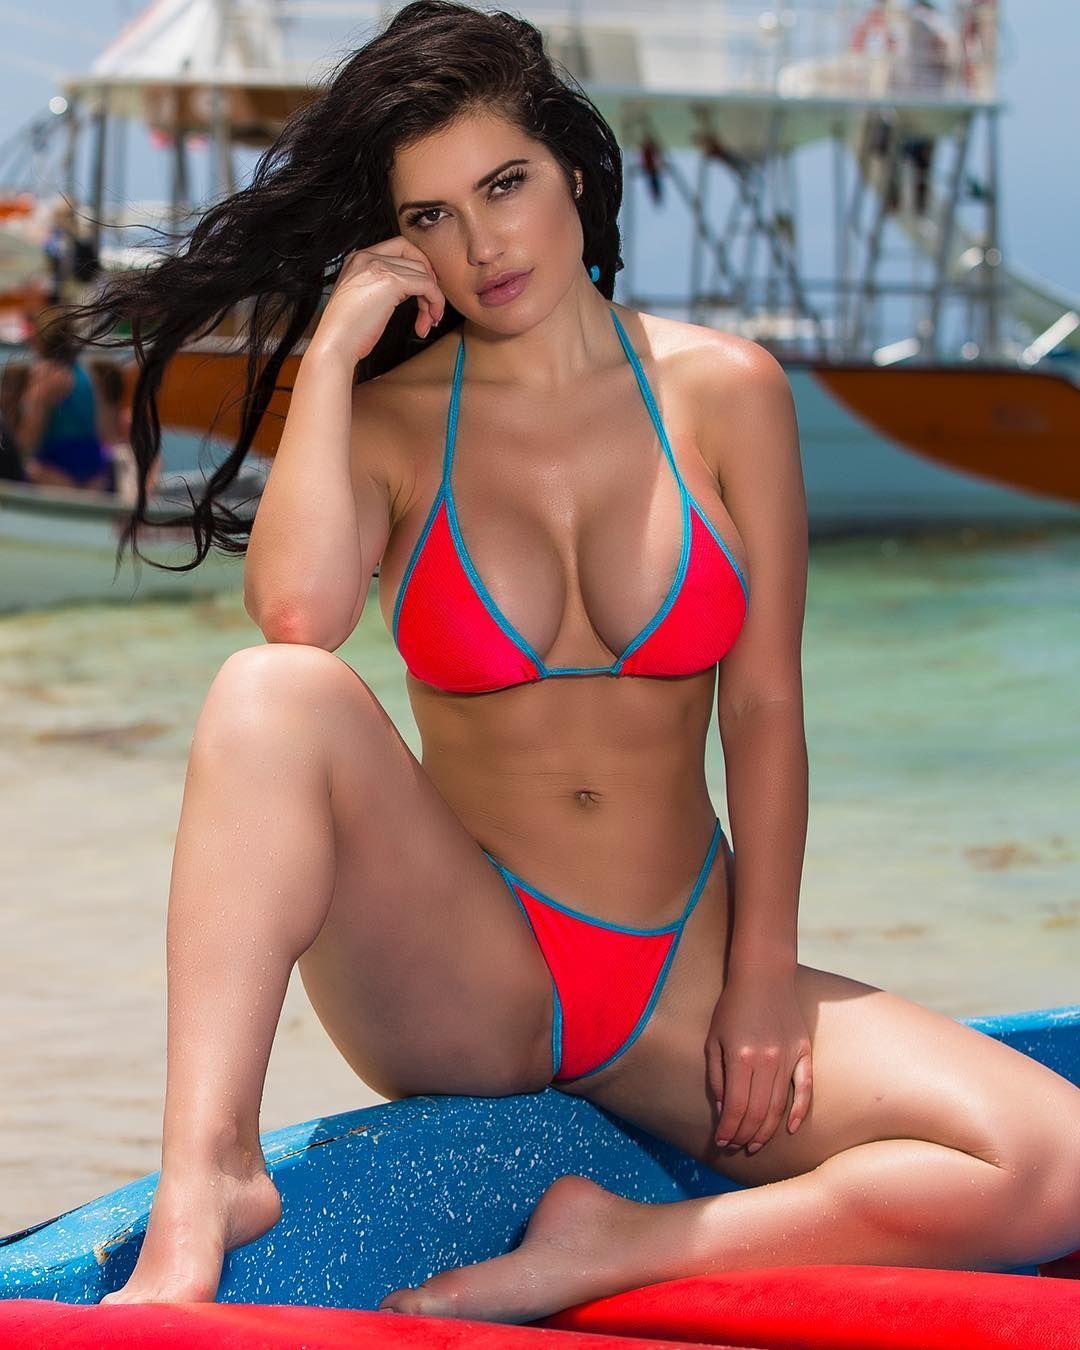 Sideboobs Gabriela Iliescu nude photos 2019